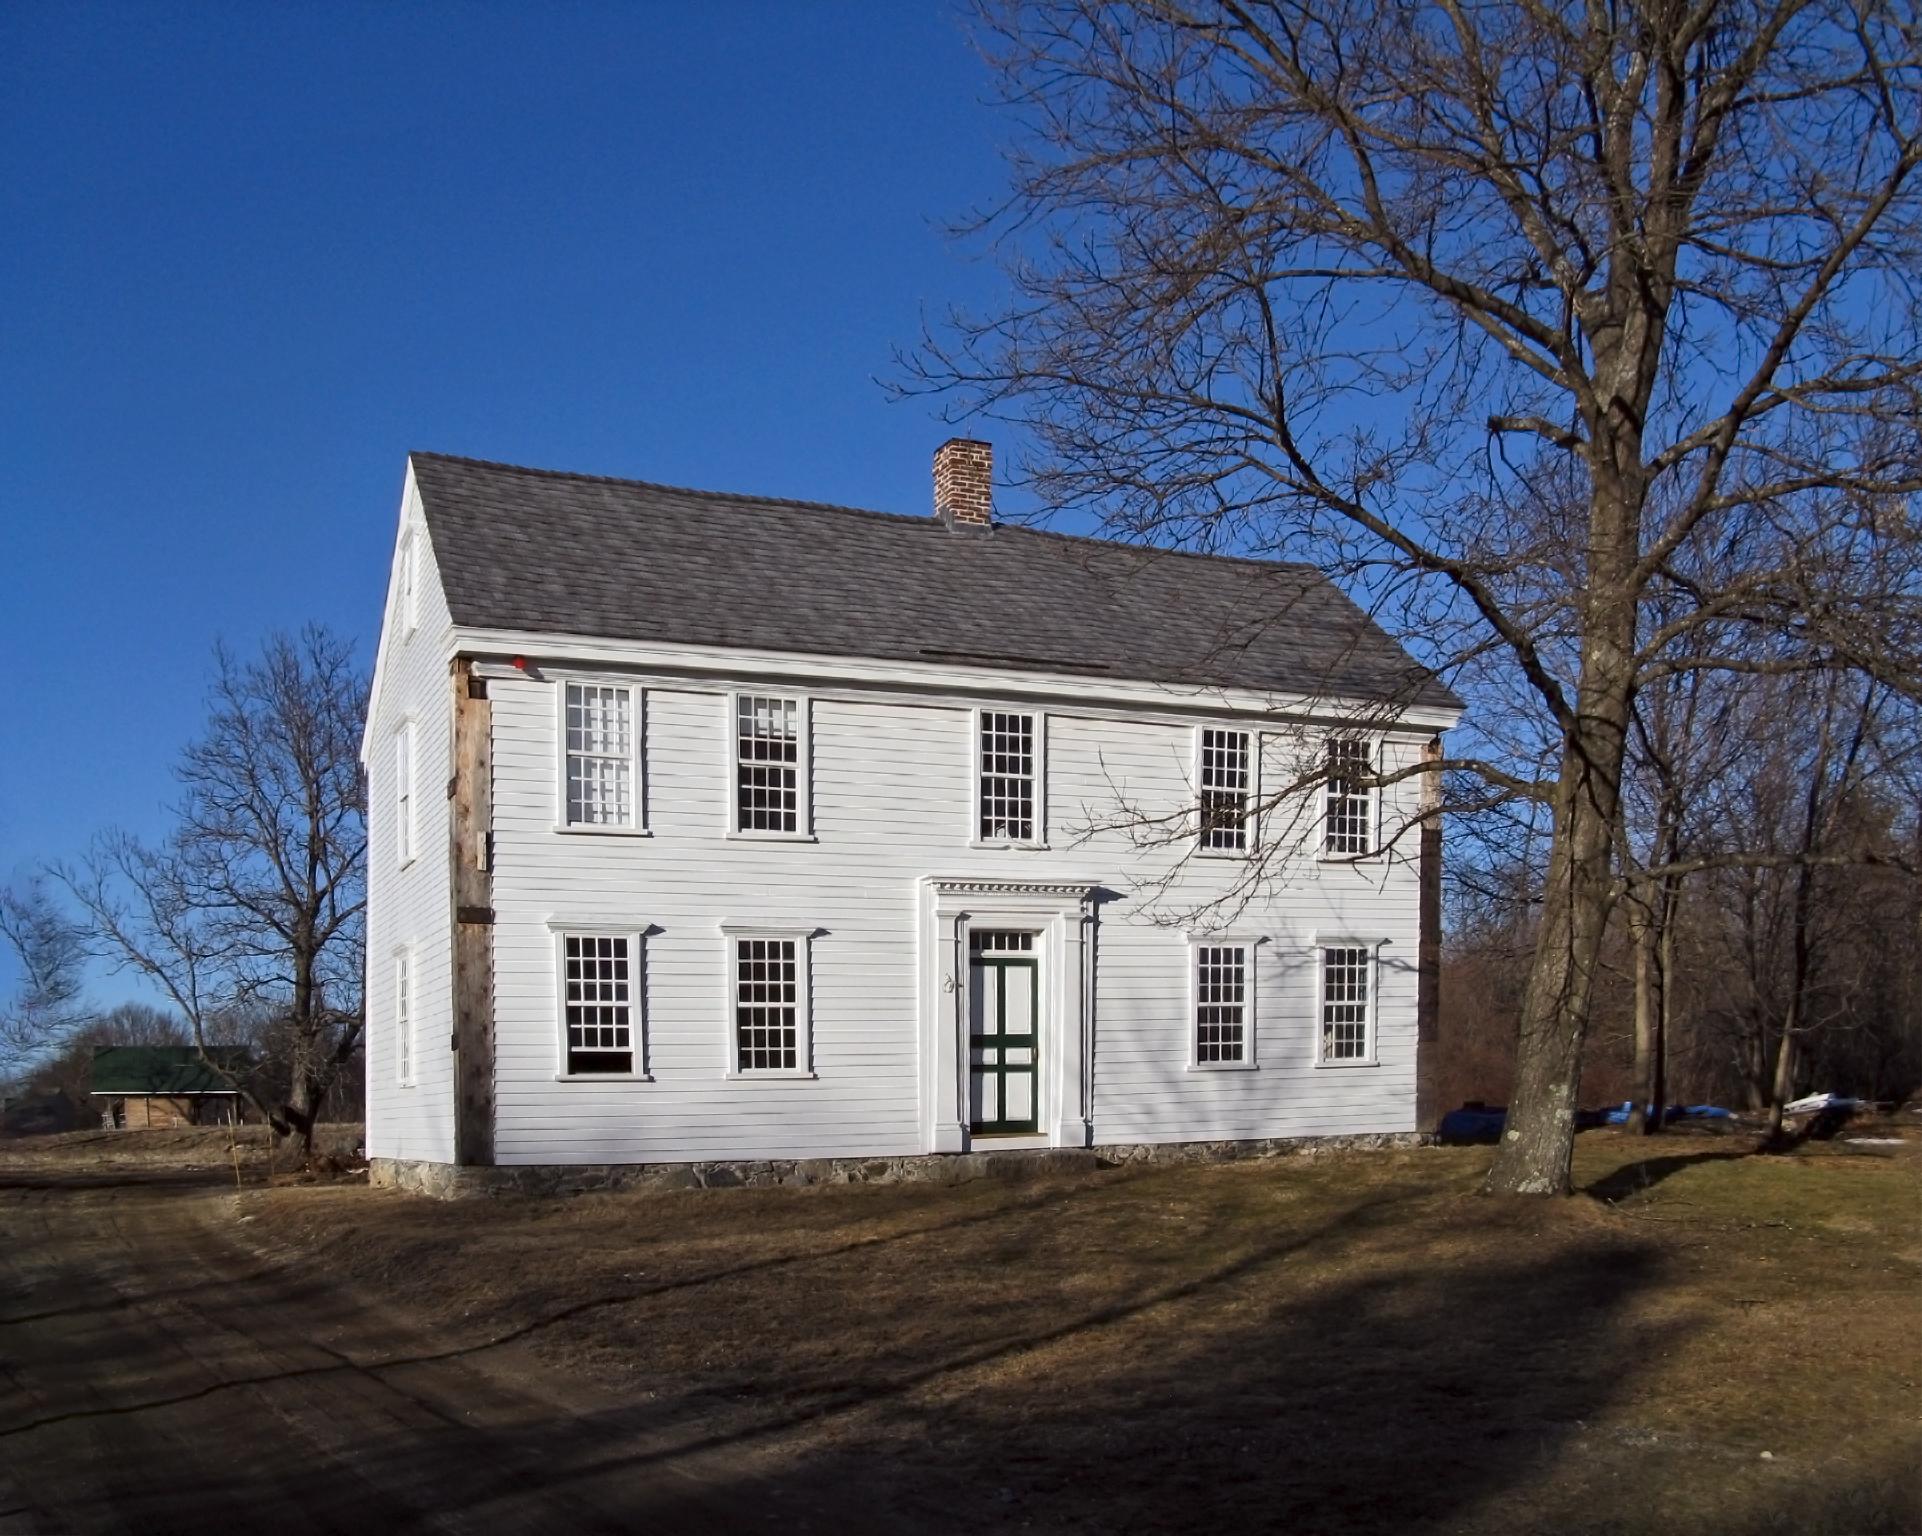 File:Wheeler-Minot Farmhouse, Concord MA.jpg - Wikimedia ...